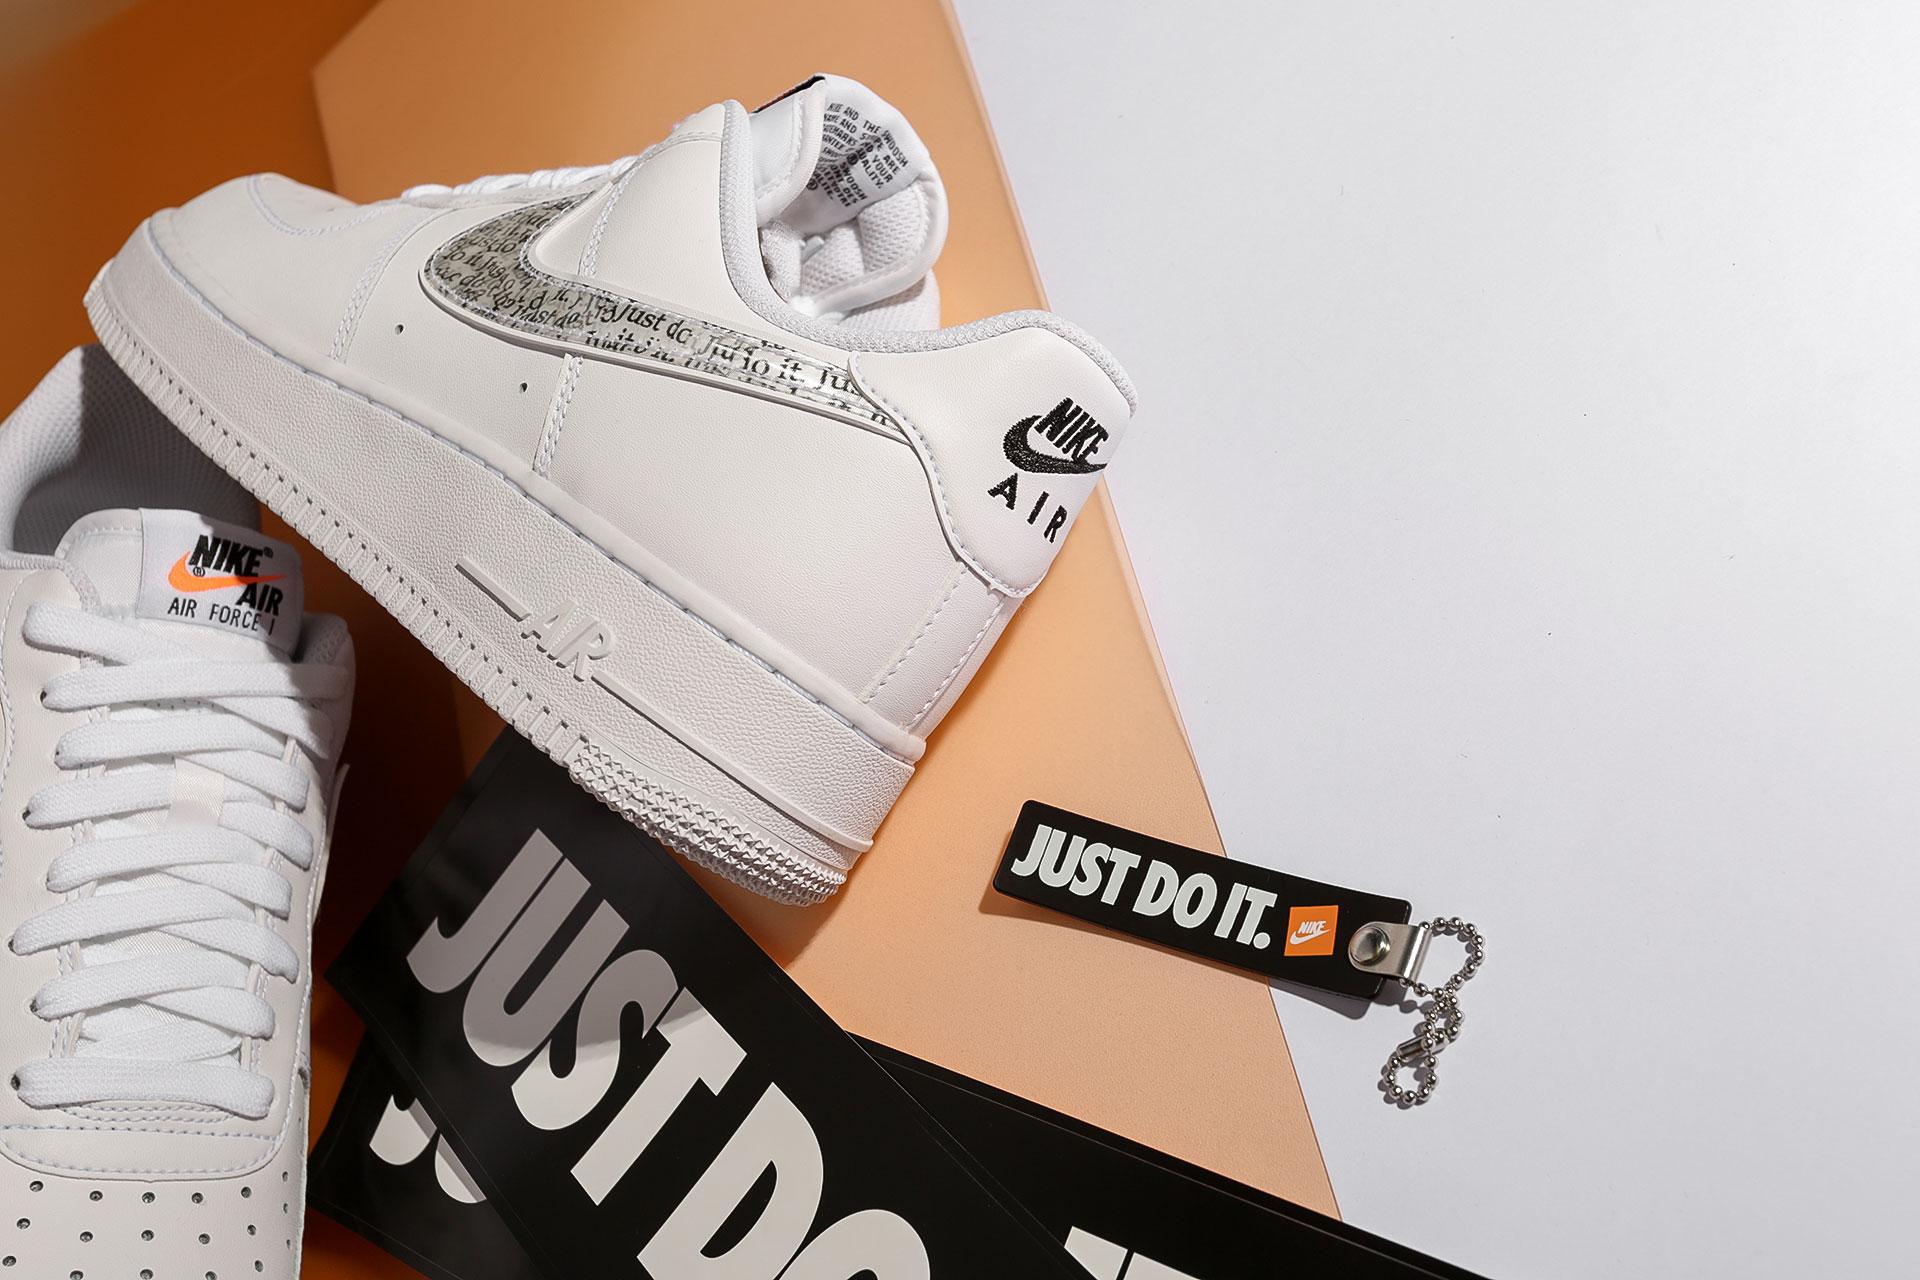 55da5bf9 ... Купить мужские белые кроссовки Nike Air Force 1 '07 LV8 JDI LNTC - фото  2 ...